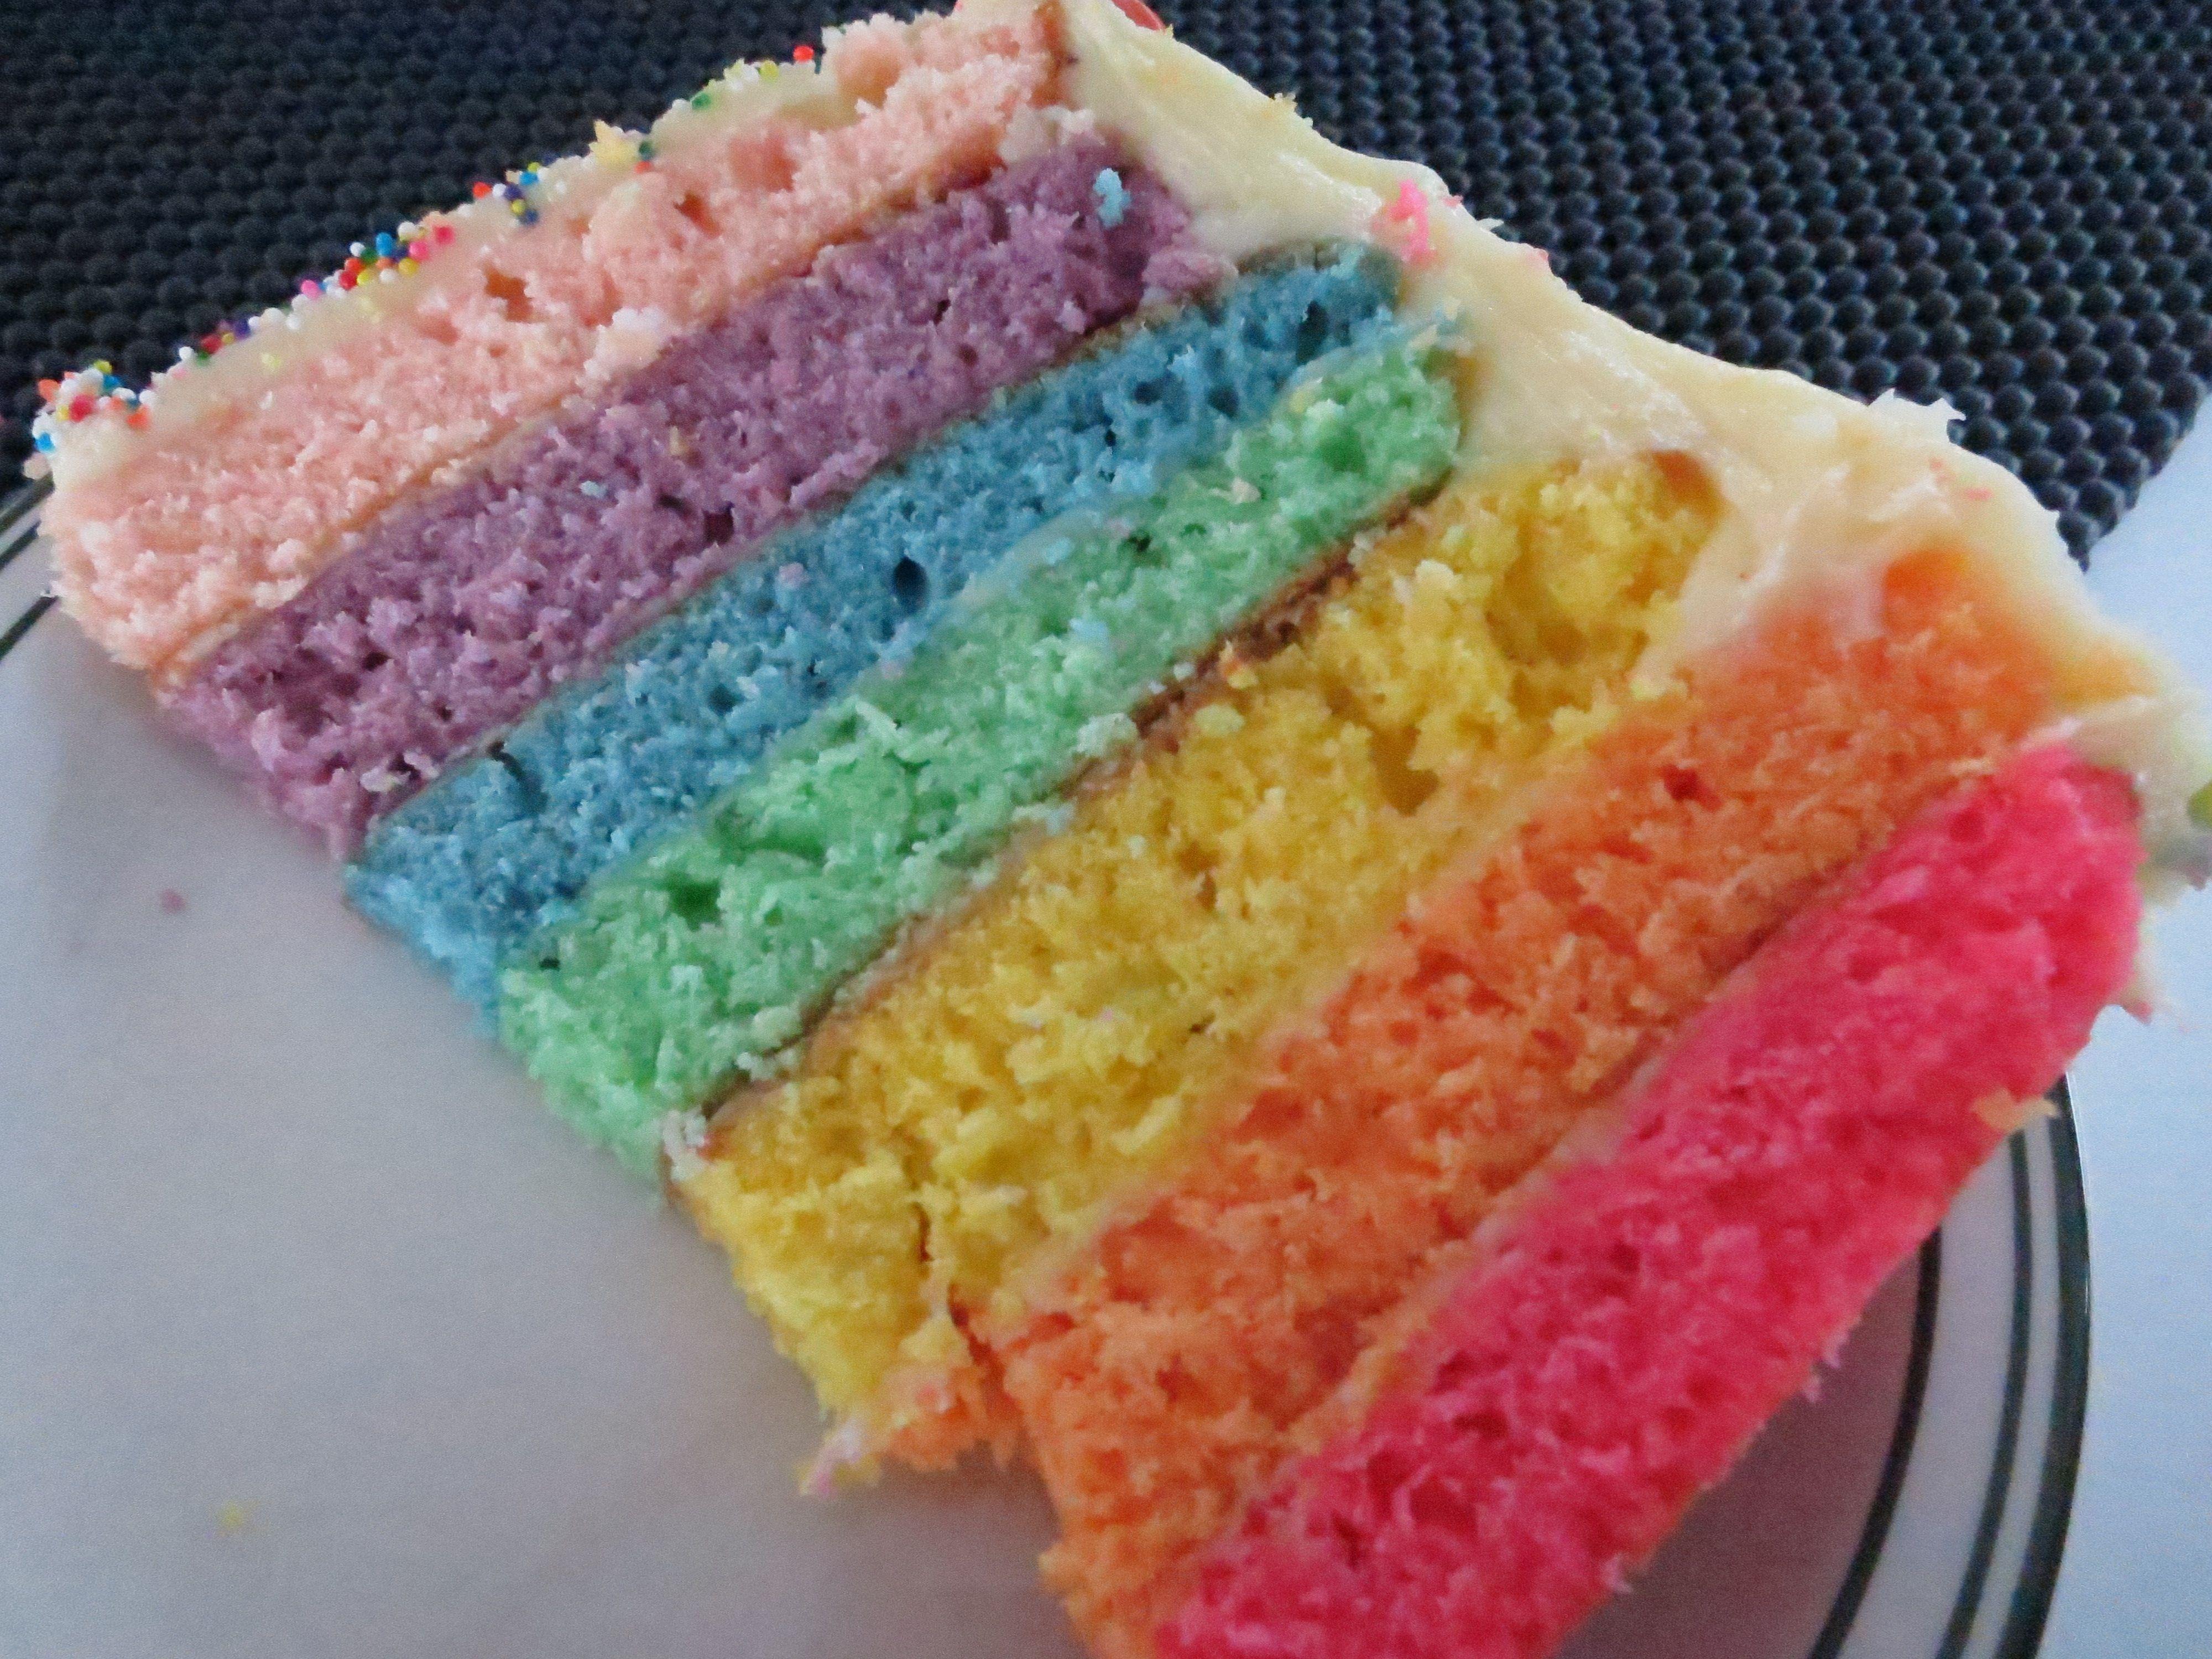 Rainbow Birthday Cake with Cream Cheese Icing Sweet Treats